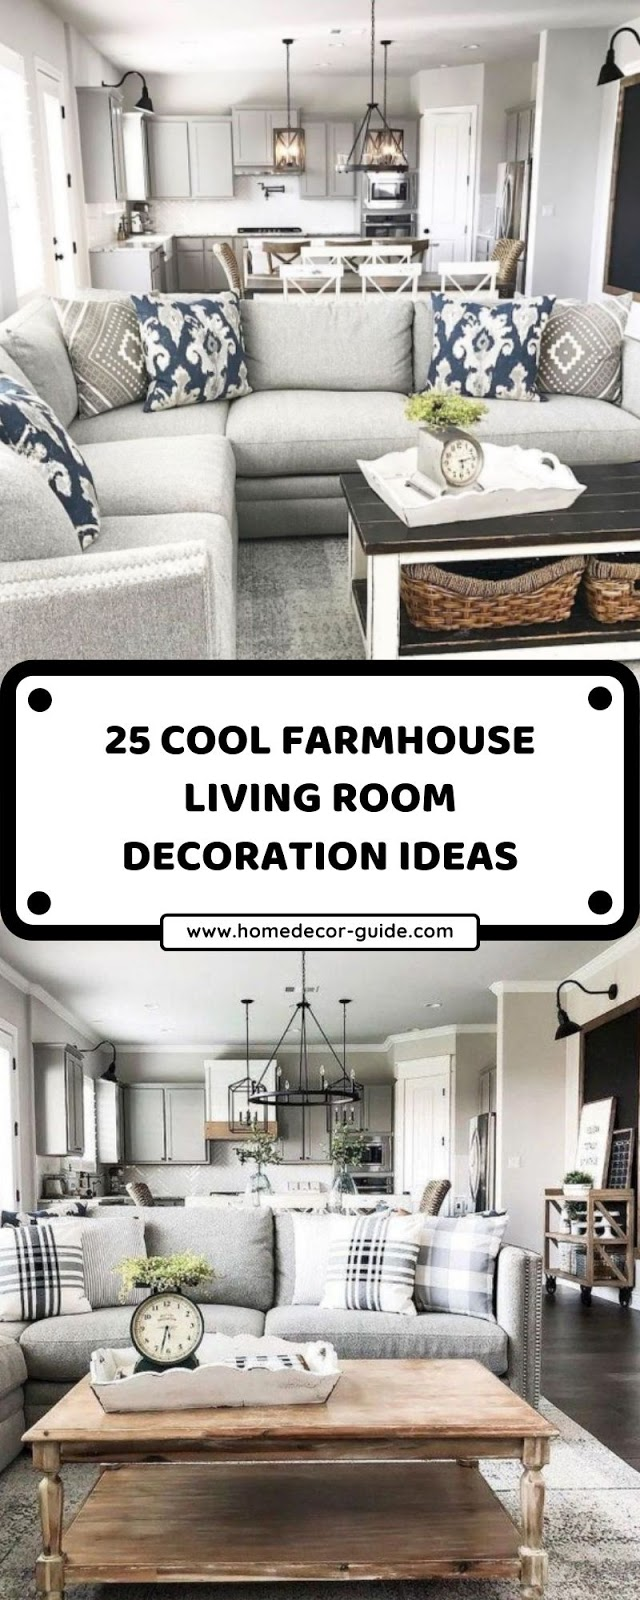 25 COOL FARMHOUSE LIVING ROOM DECORATION IDEAS